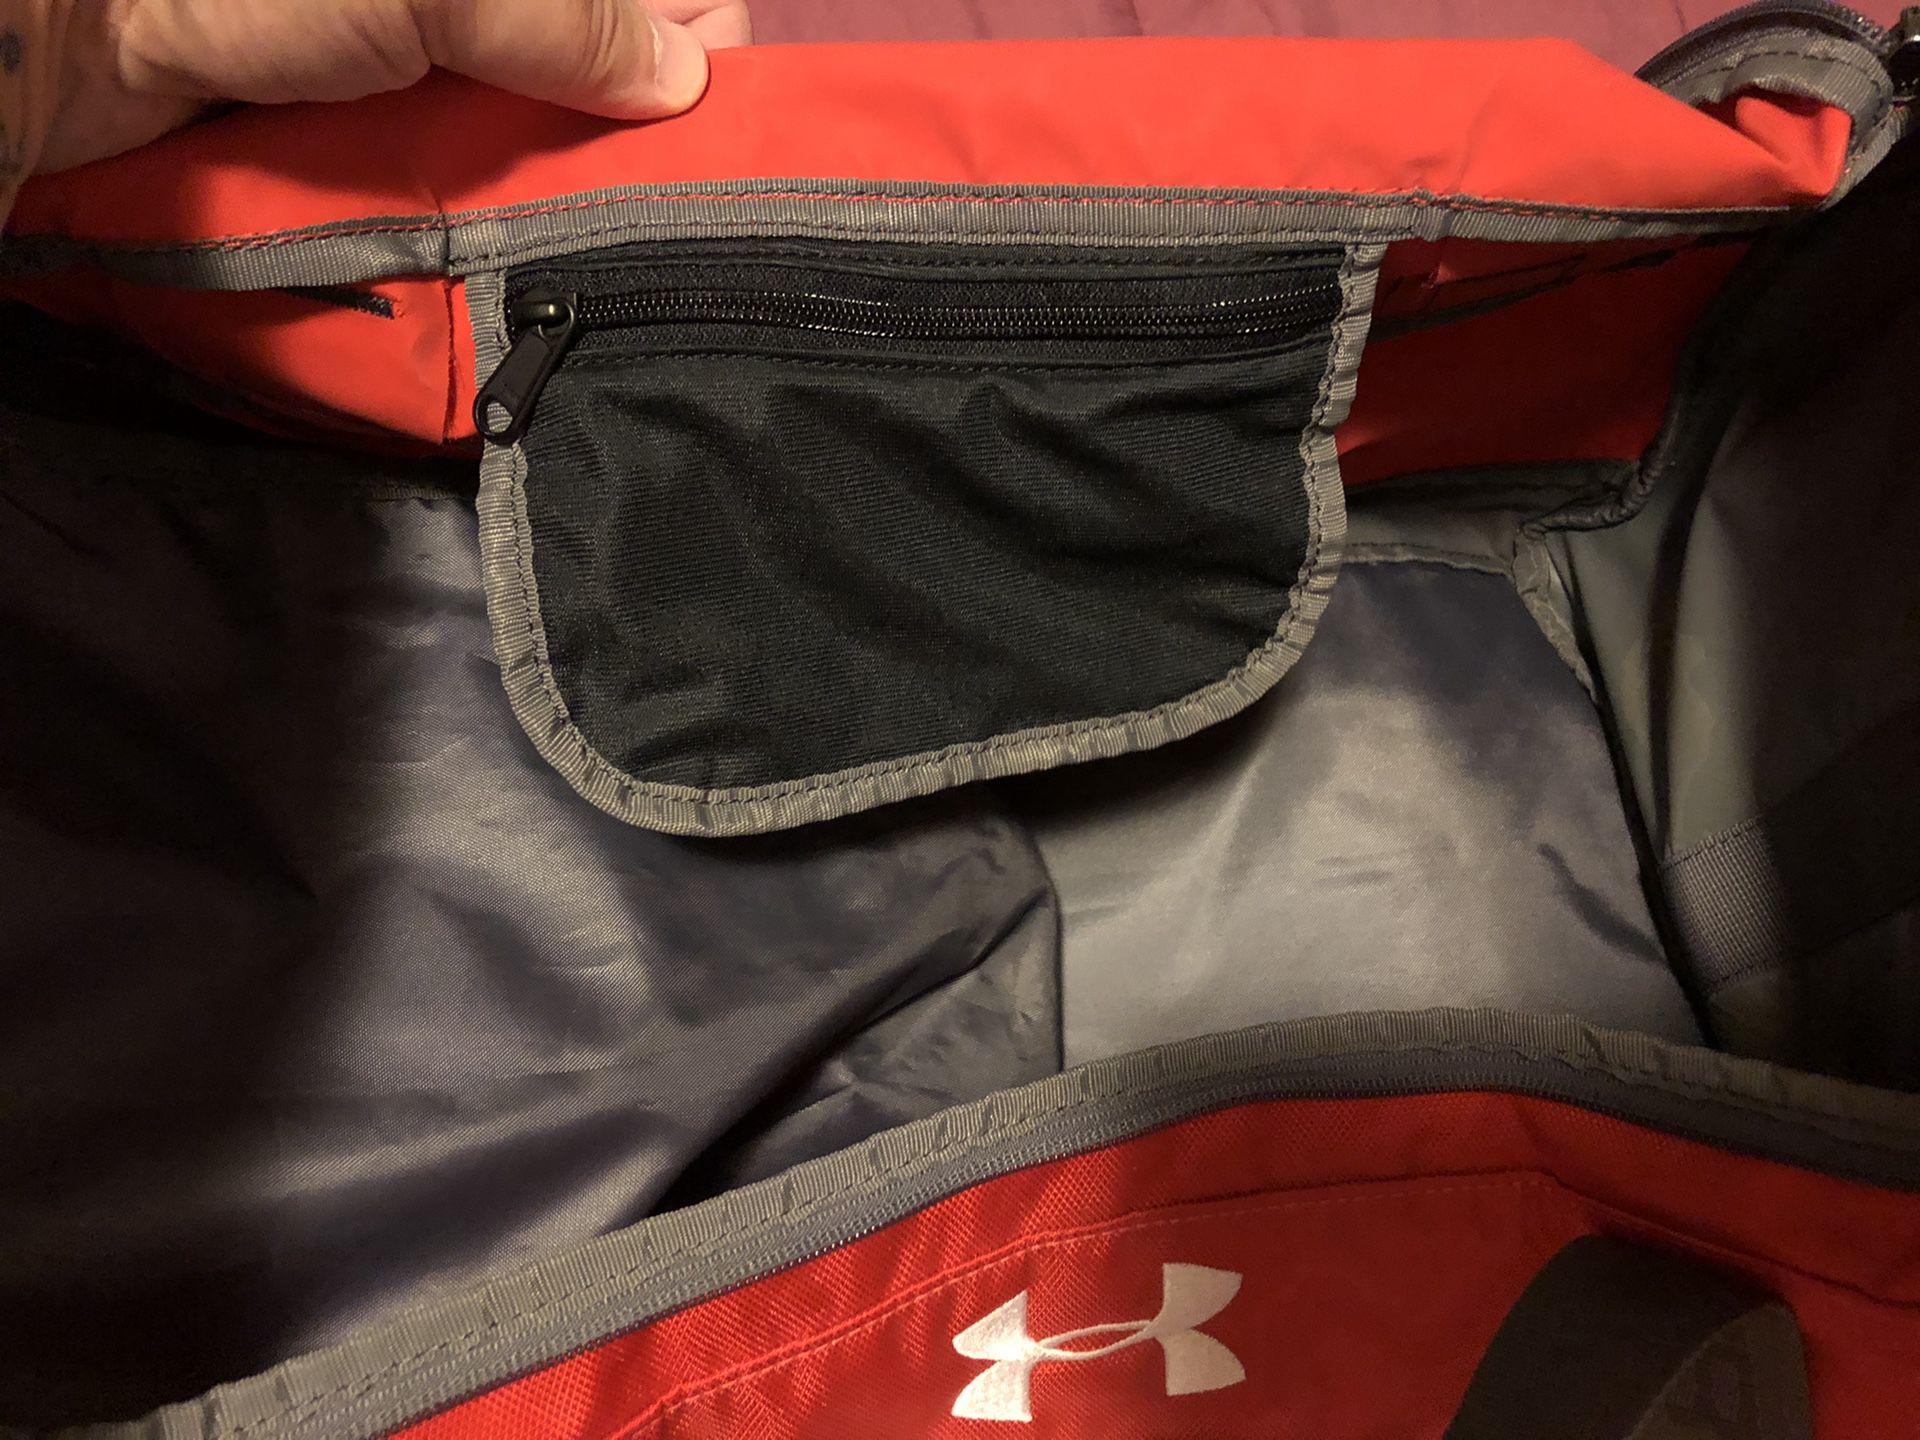 Under Armour Duffle Bag.